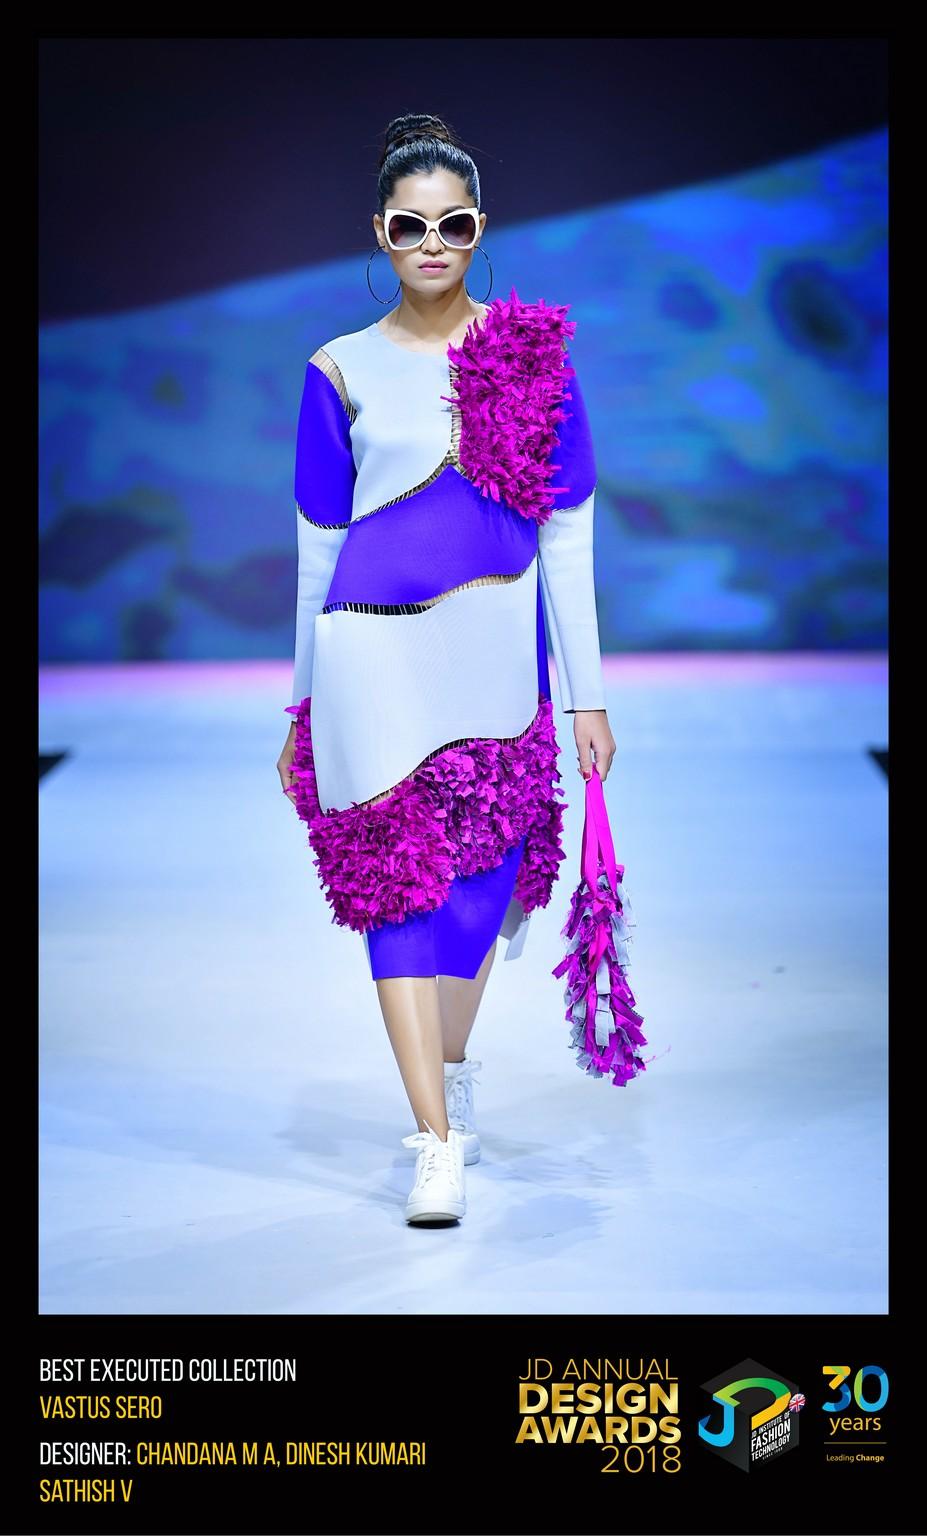 Vastus Sero – Change – JD Annual Design Awards 2018 | Designer: Chandana, Dinesh and Sathish | Photography : Jerin Nath (@jerin_nath) vastus sero – change – jd annual design awards 2018 - VASTUS SERO3 - Vastus Sero – Change – JD Annual Design Awards 2018